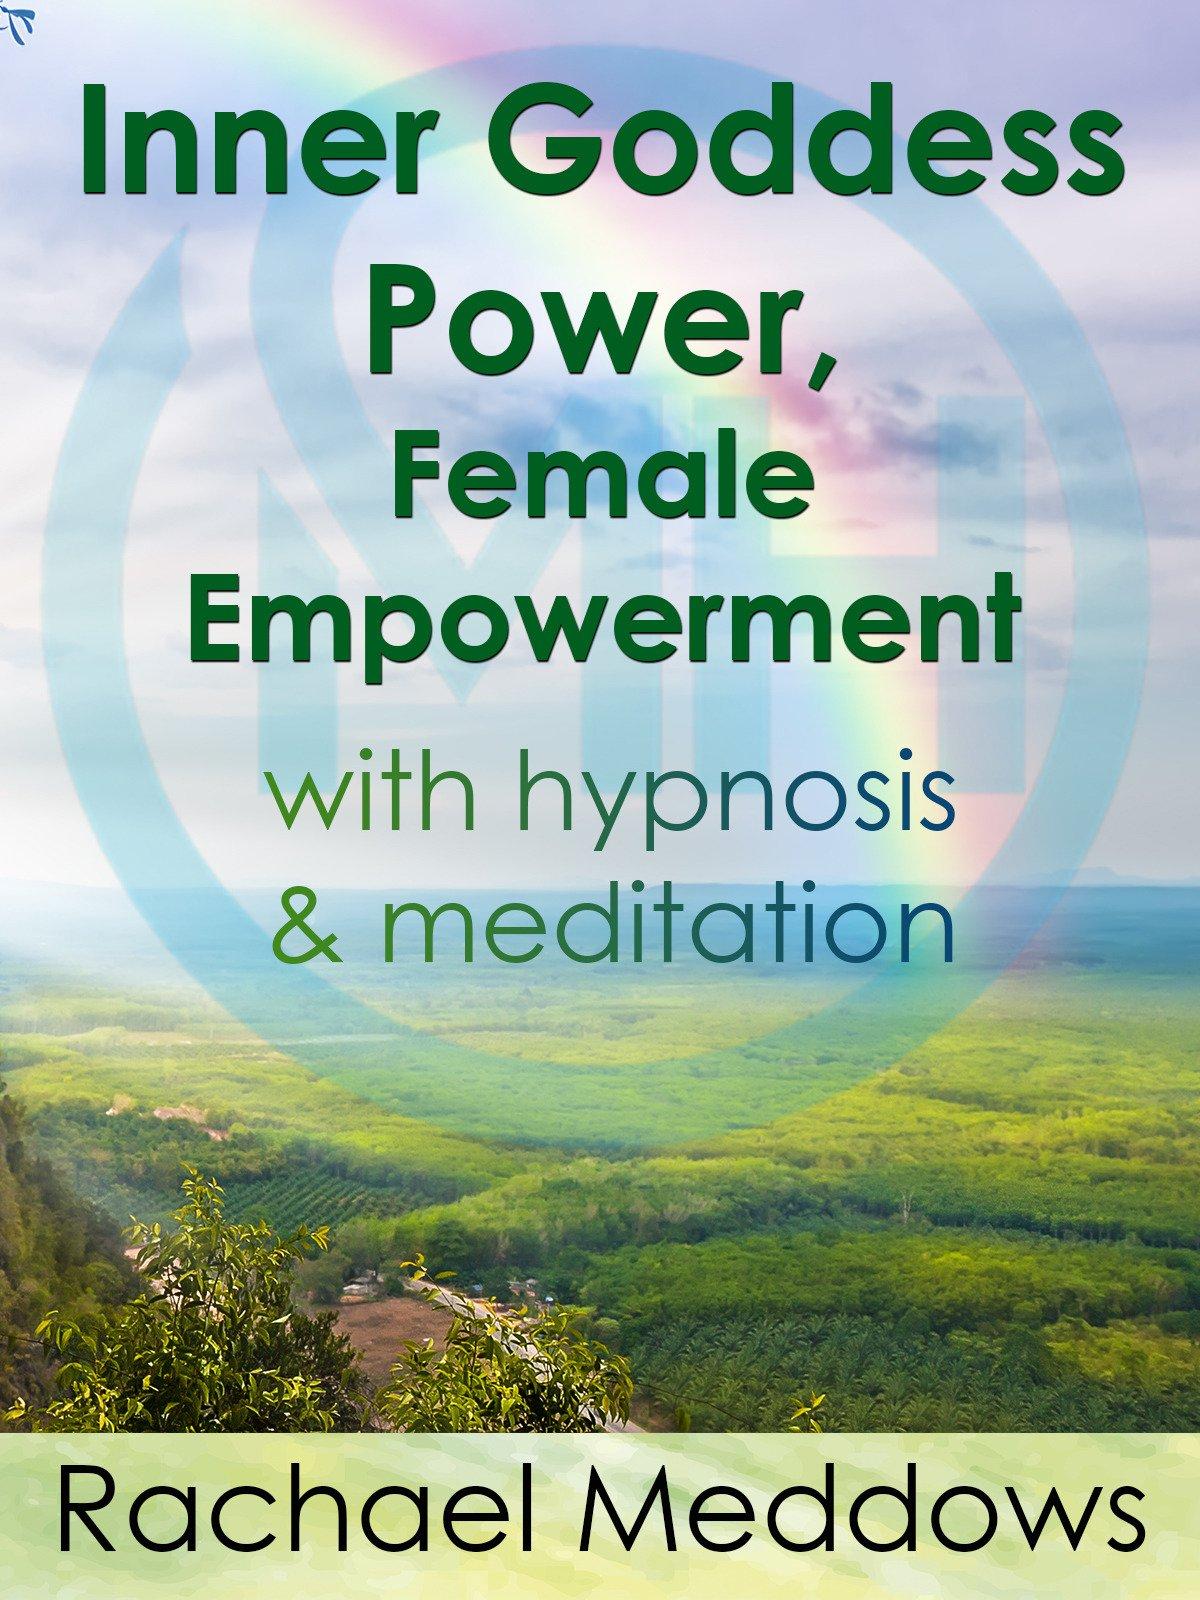 Inner Goddess Power, Female Empowerment with Meditation & Hypnosis from Rachael Meddows on Amazon Prime Video UK